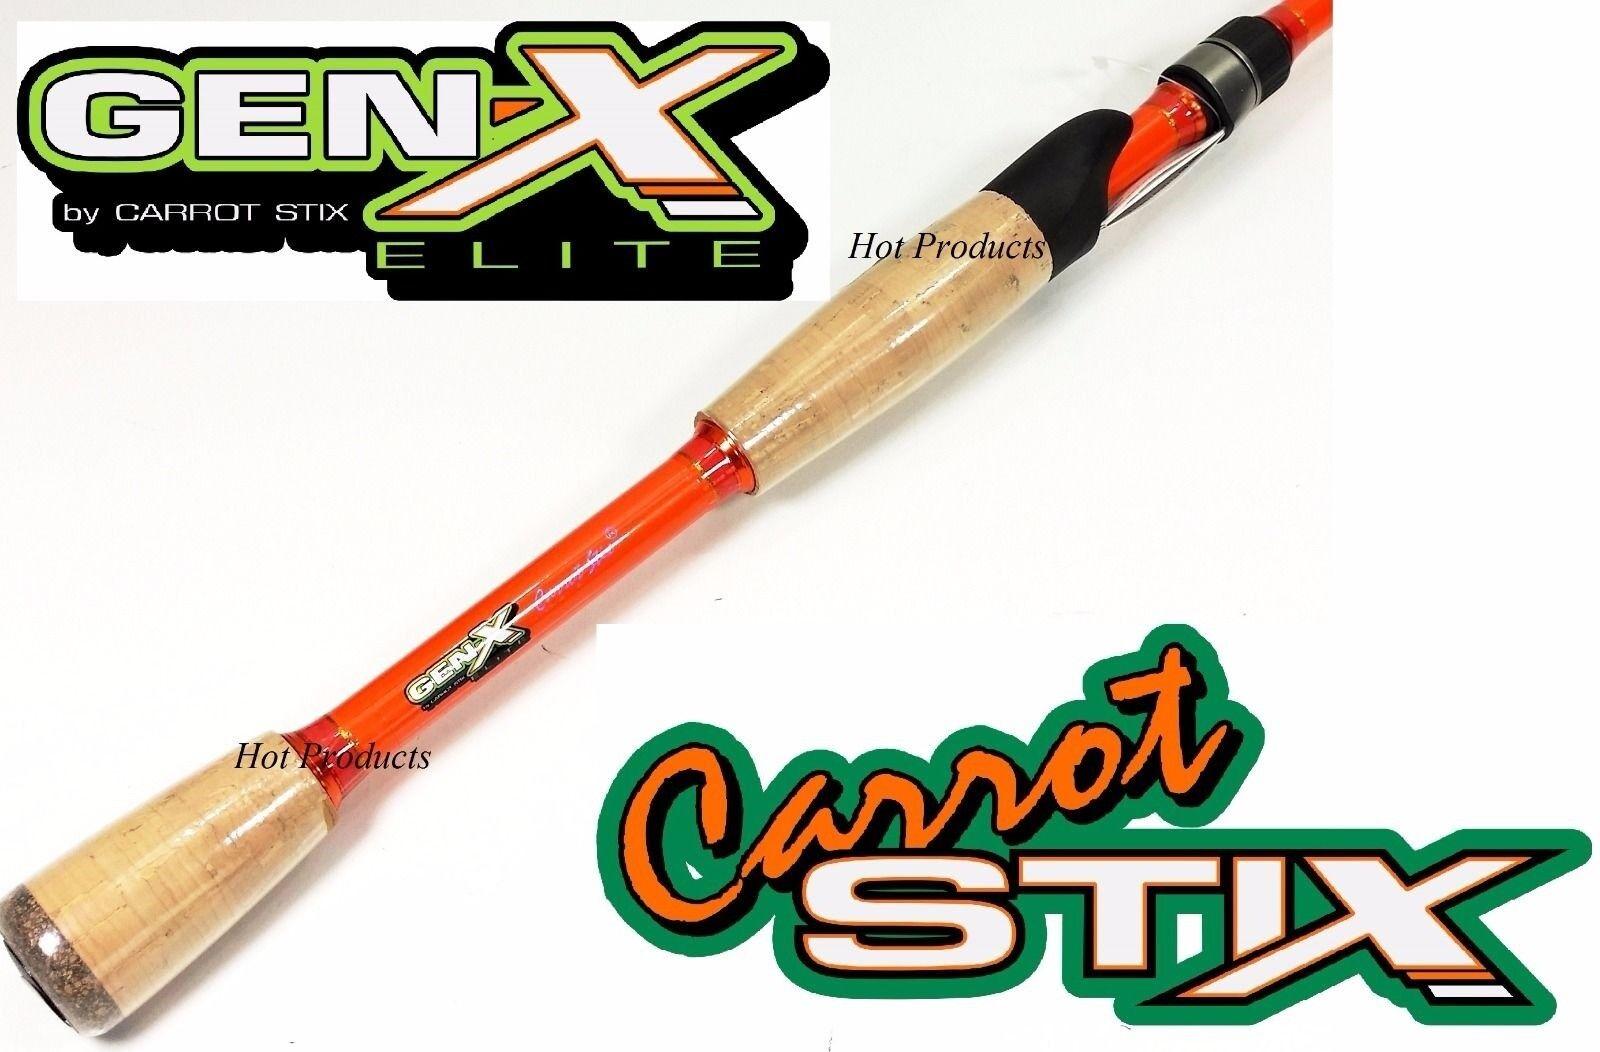 Carred Stix SPINNING 6'7  MH Medium Heavy GEN X ELITE Fishing Rod CGXE671MH-F-S